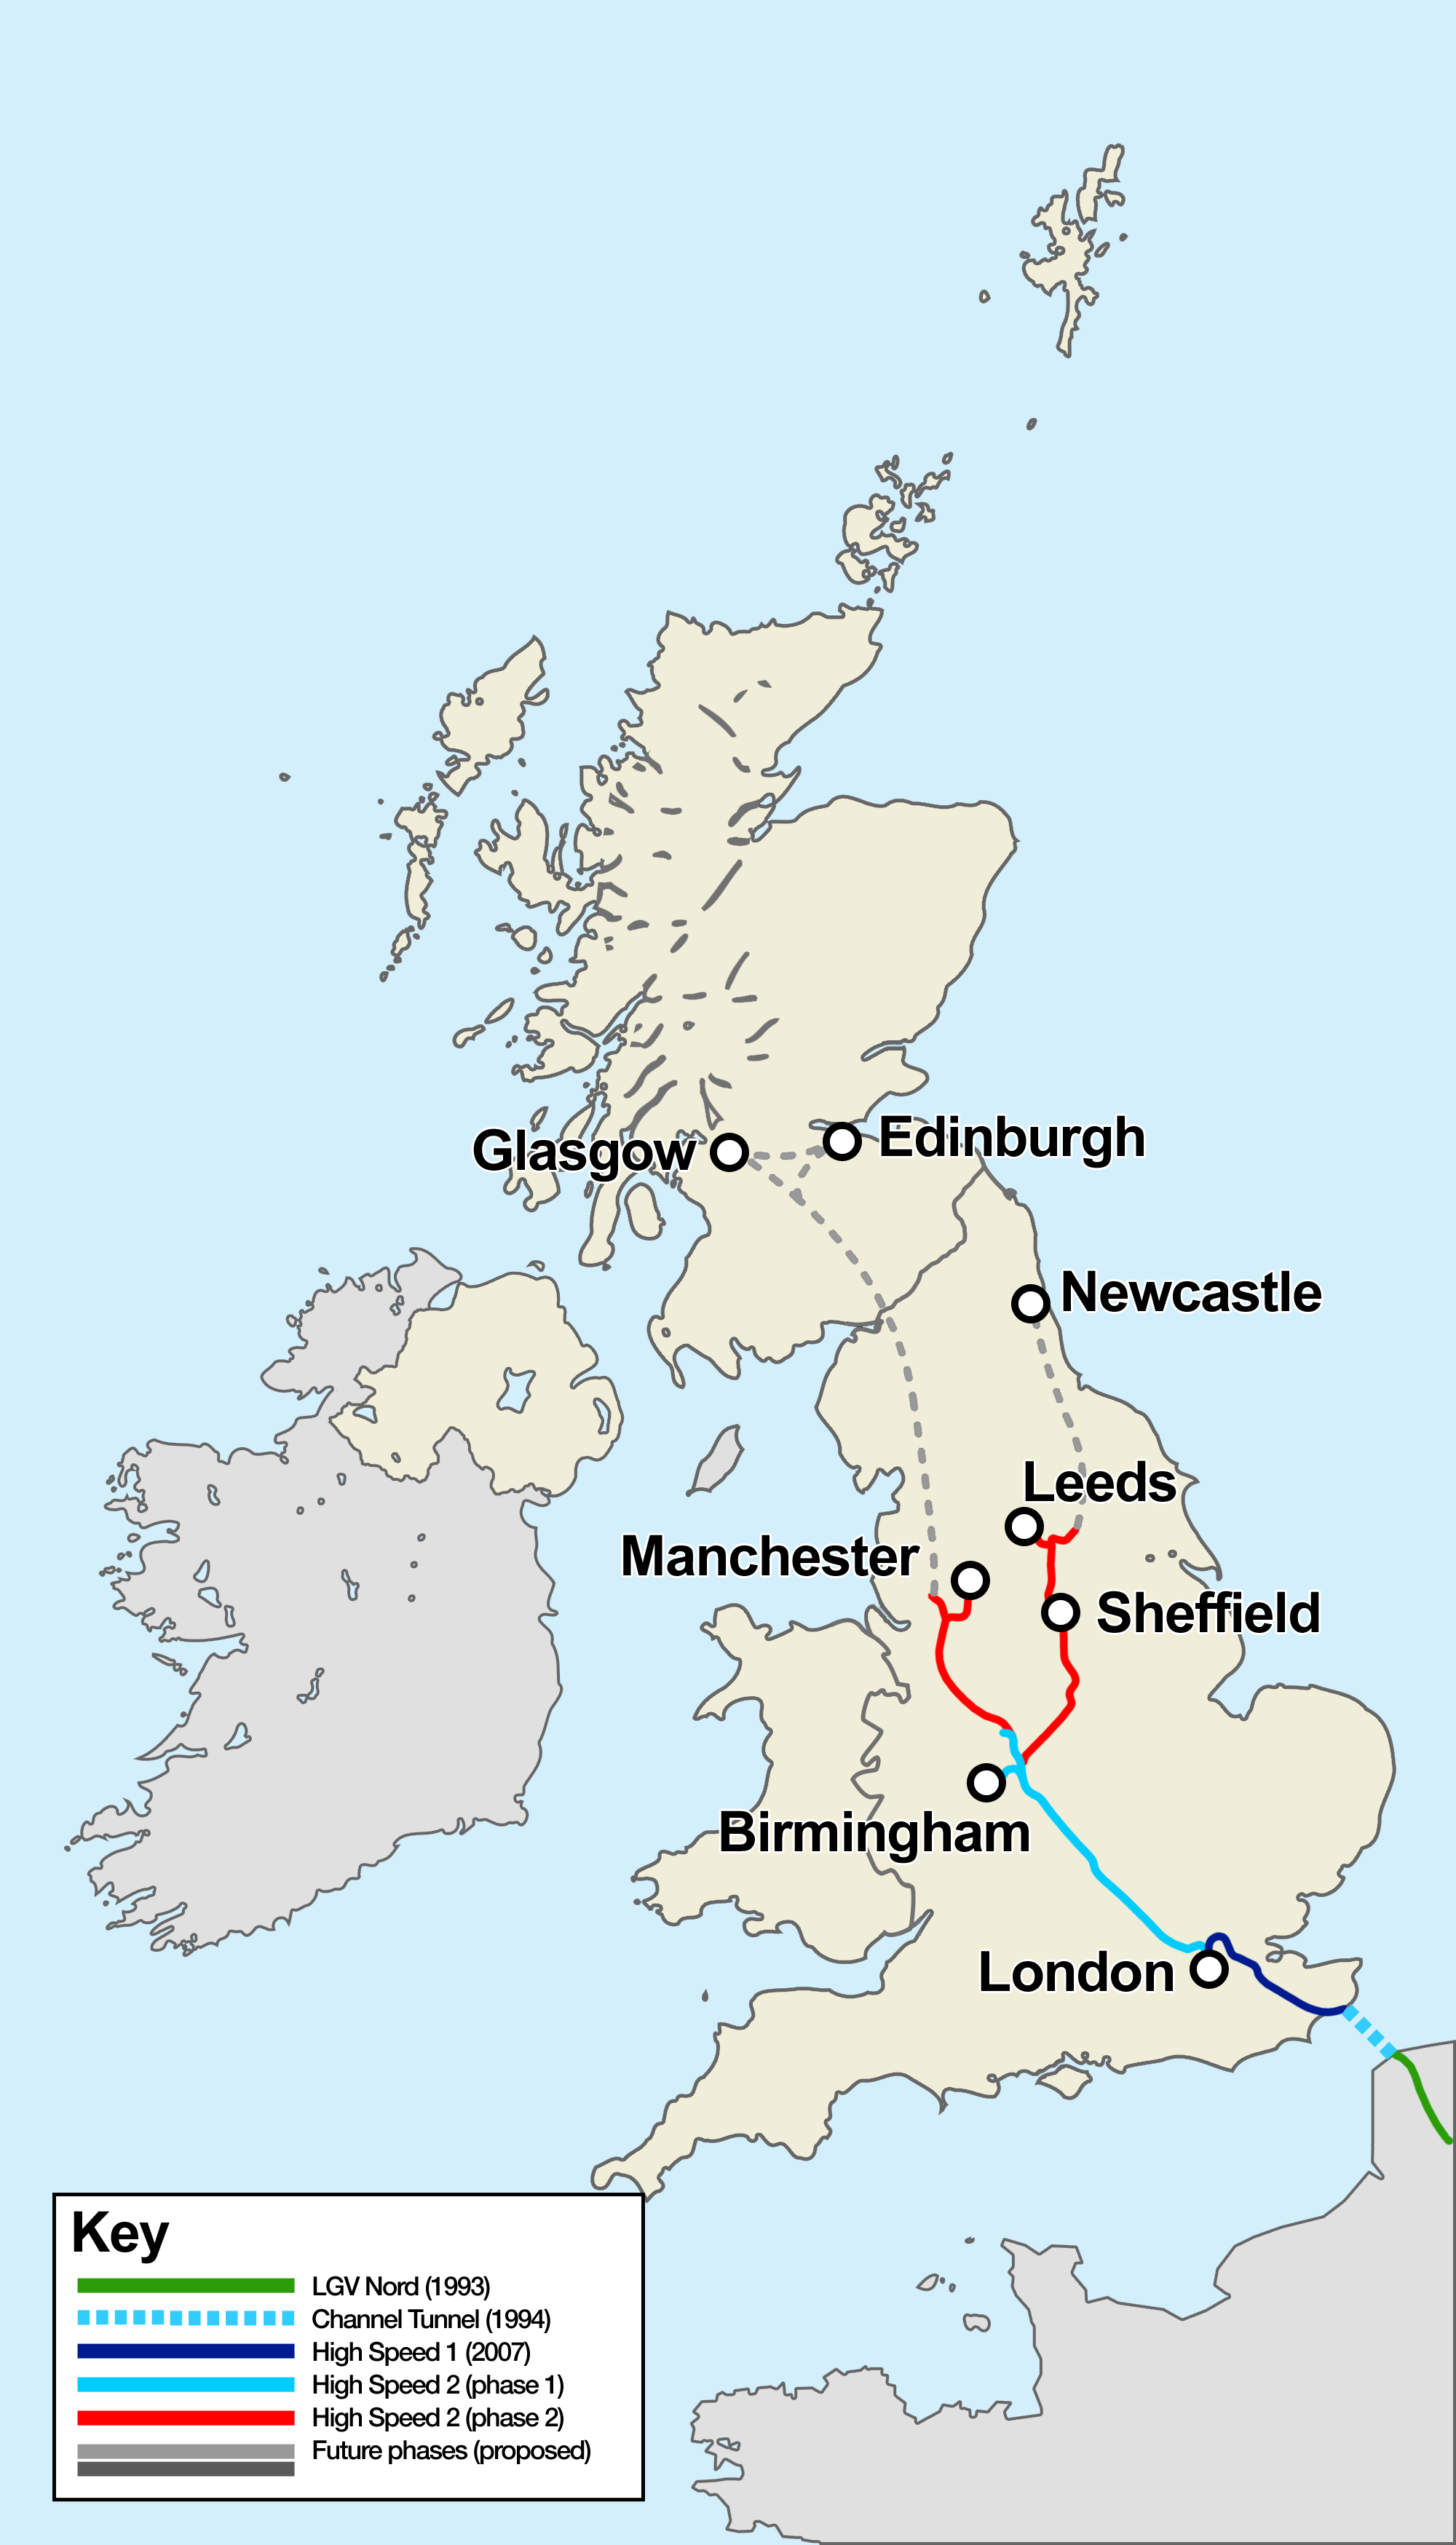 uk_high_speed_rail_map.png